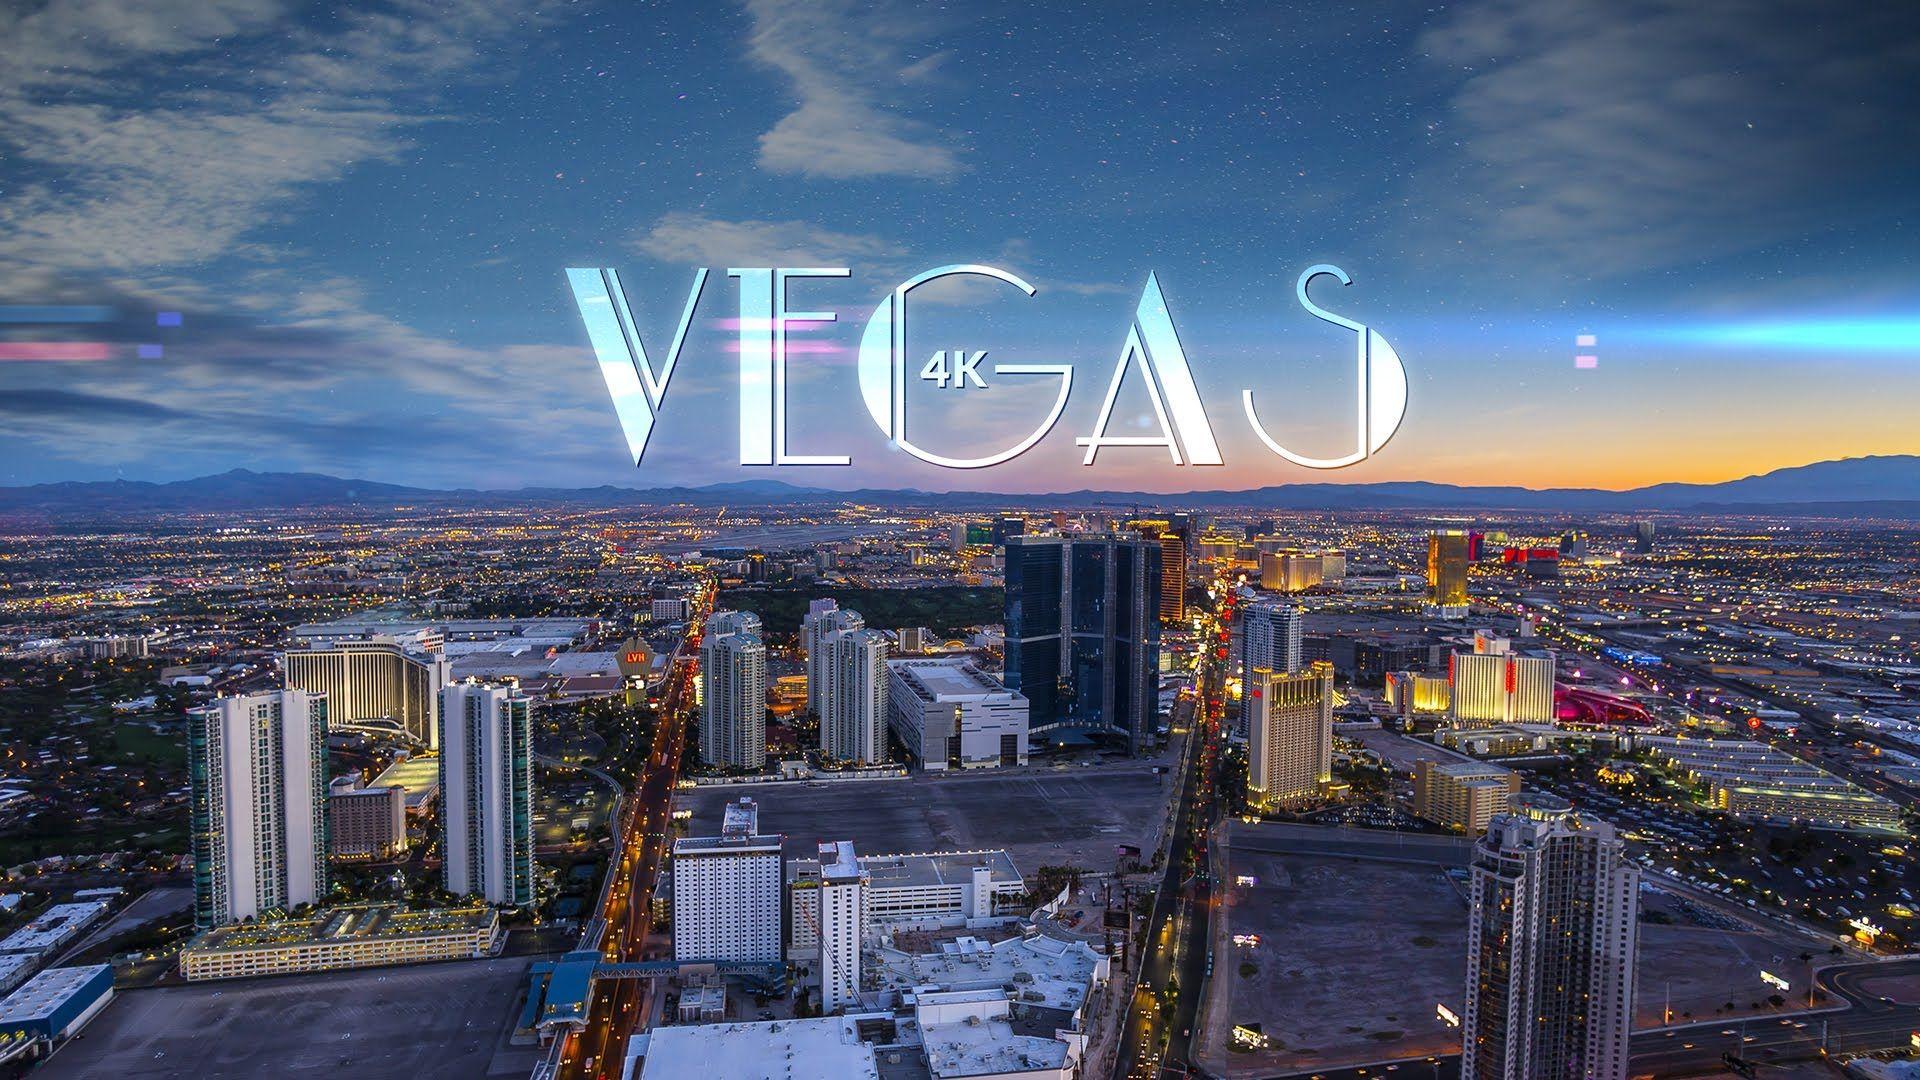 Vegas 4k An Ultra High Definition Time Lapse Video Of Sin City At Night Laughing Squid Vegas Las Vegas City